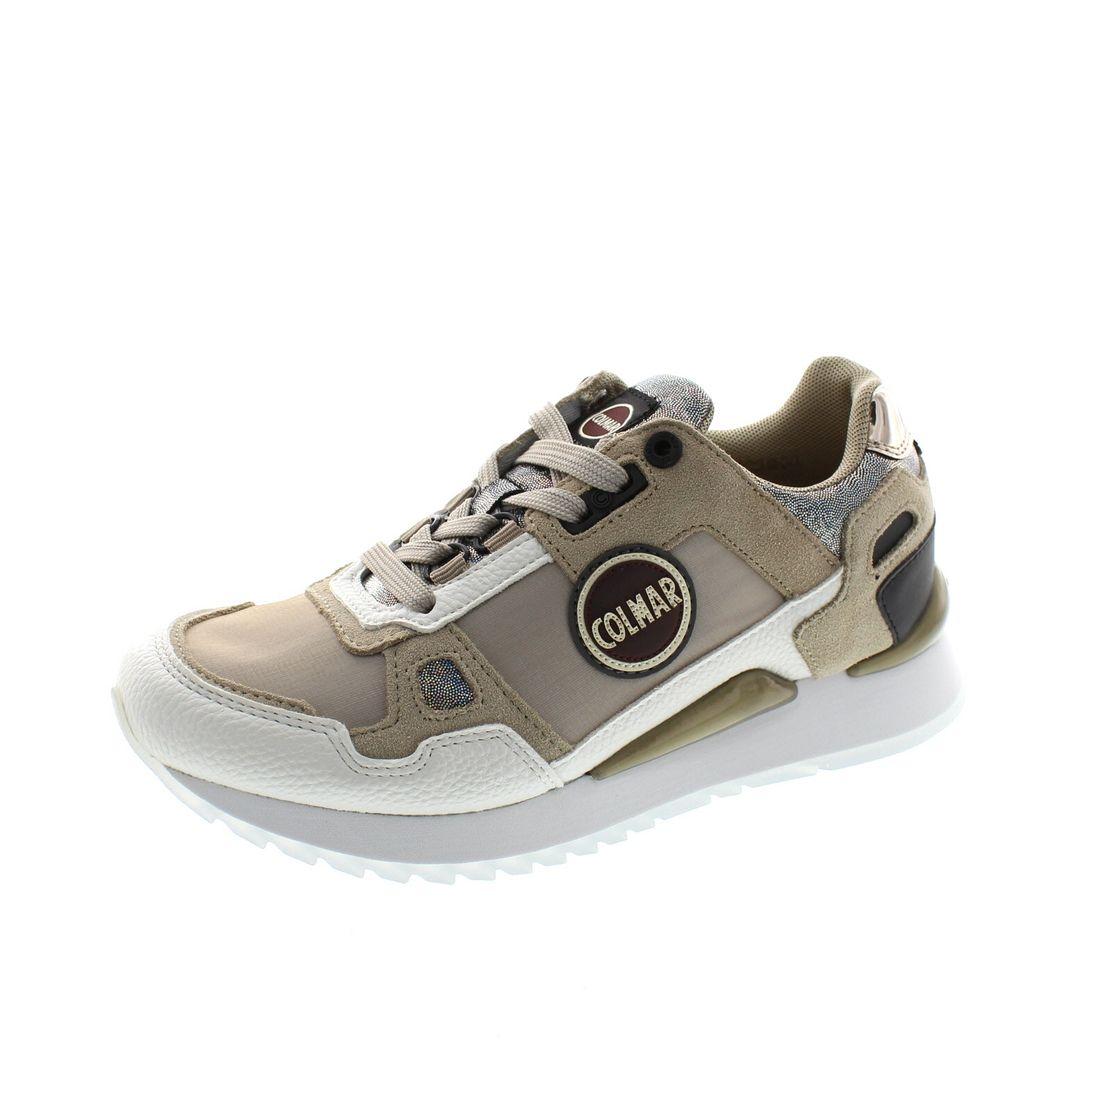 COLMAR Damenschuhe - Sneaker Tyler Galax 146 - gray silver